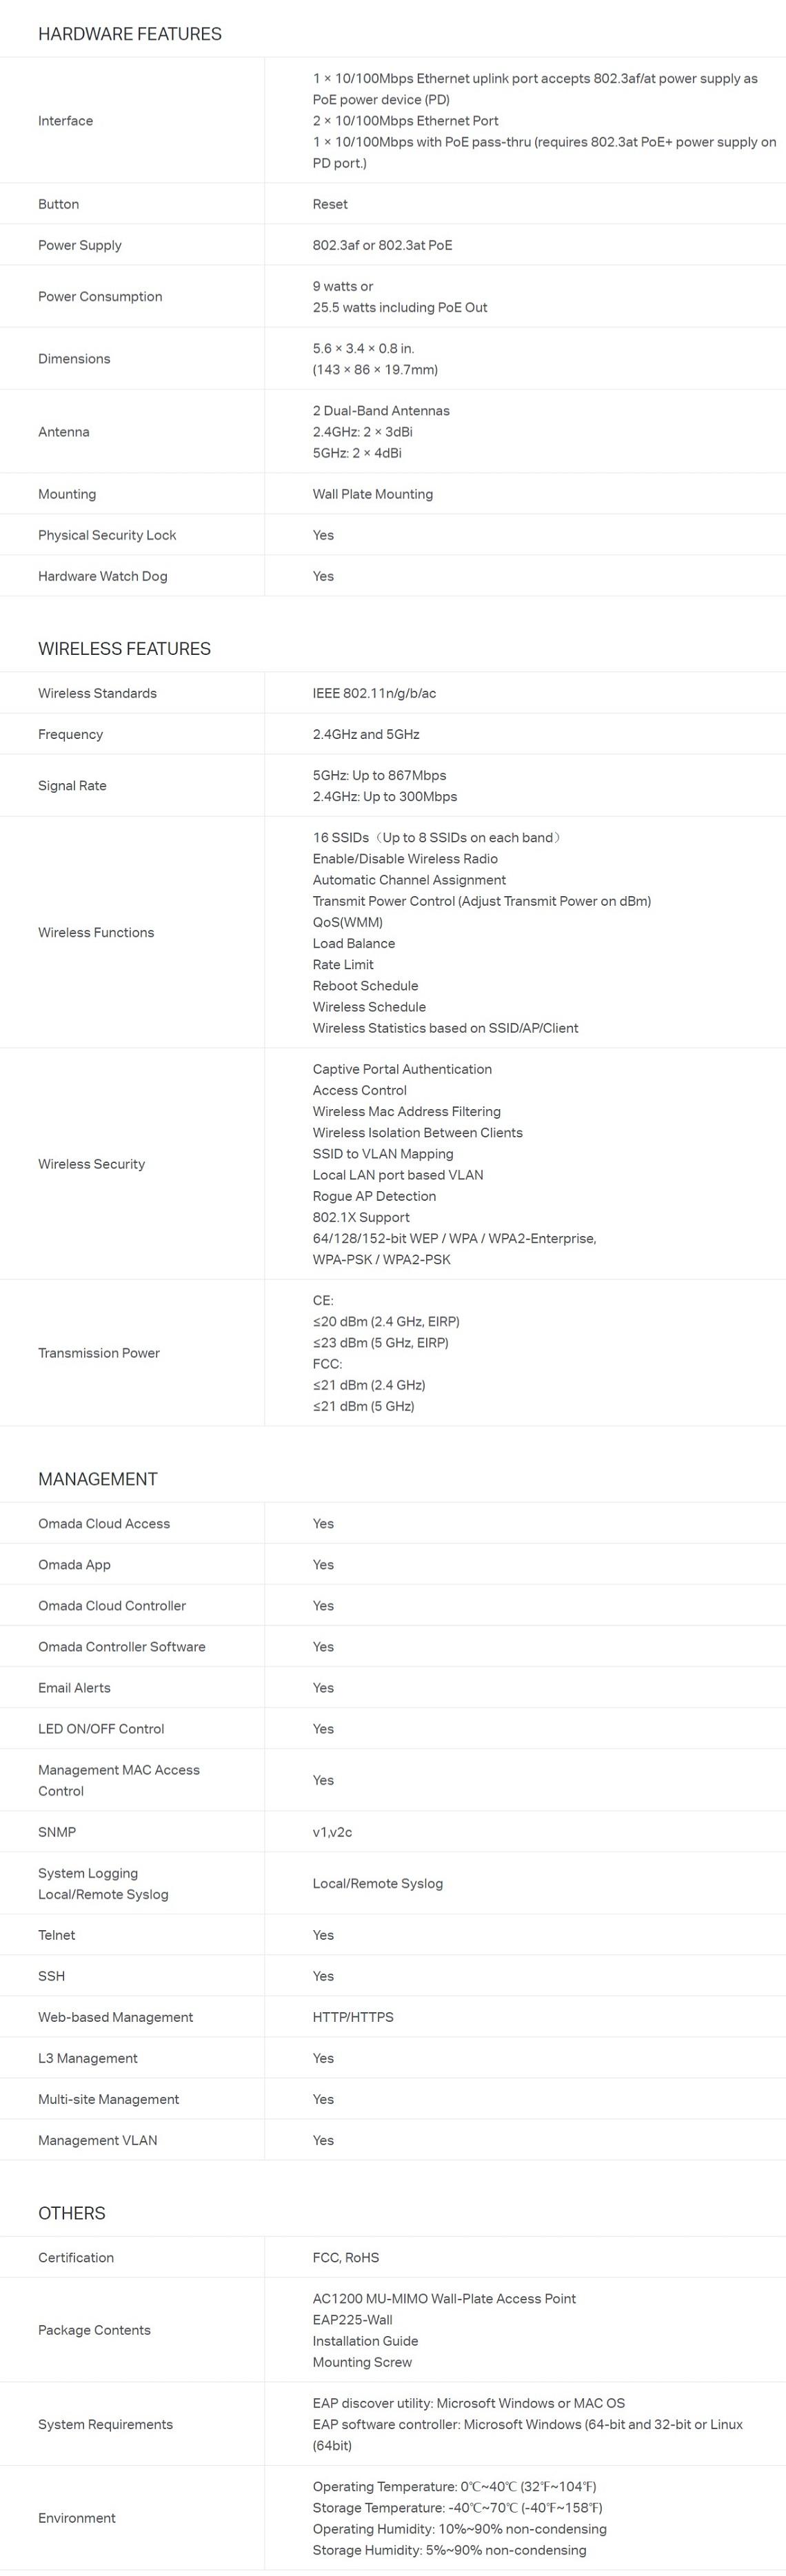 TP-Link EAP225-WALL Omada AC1200 Wireless MU-MIMO Wall-Plate Access Point